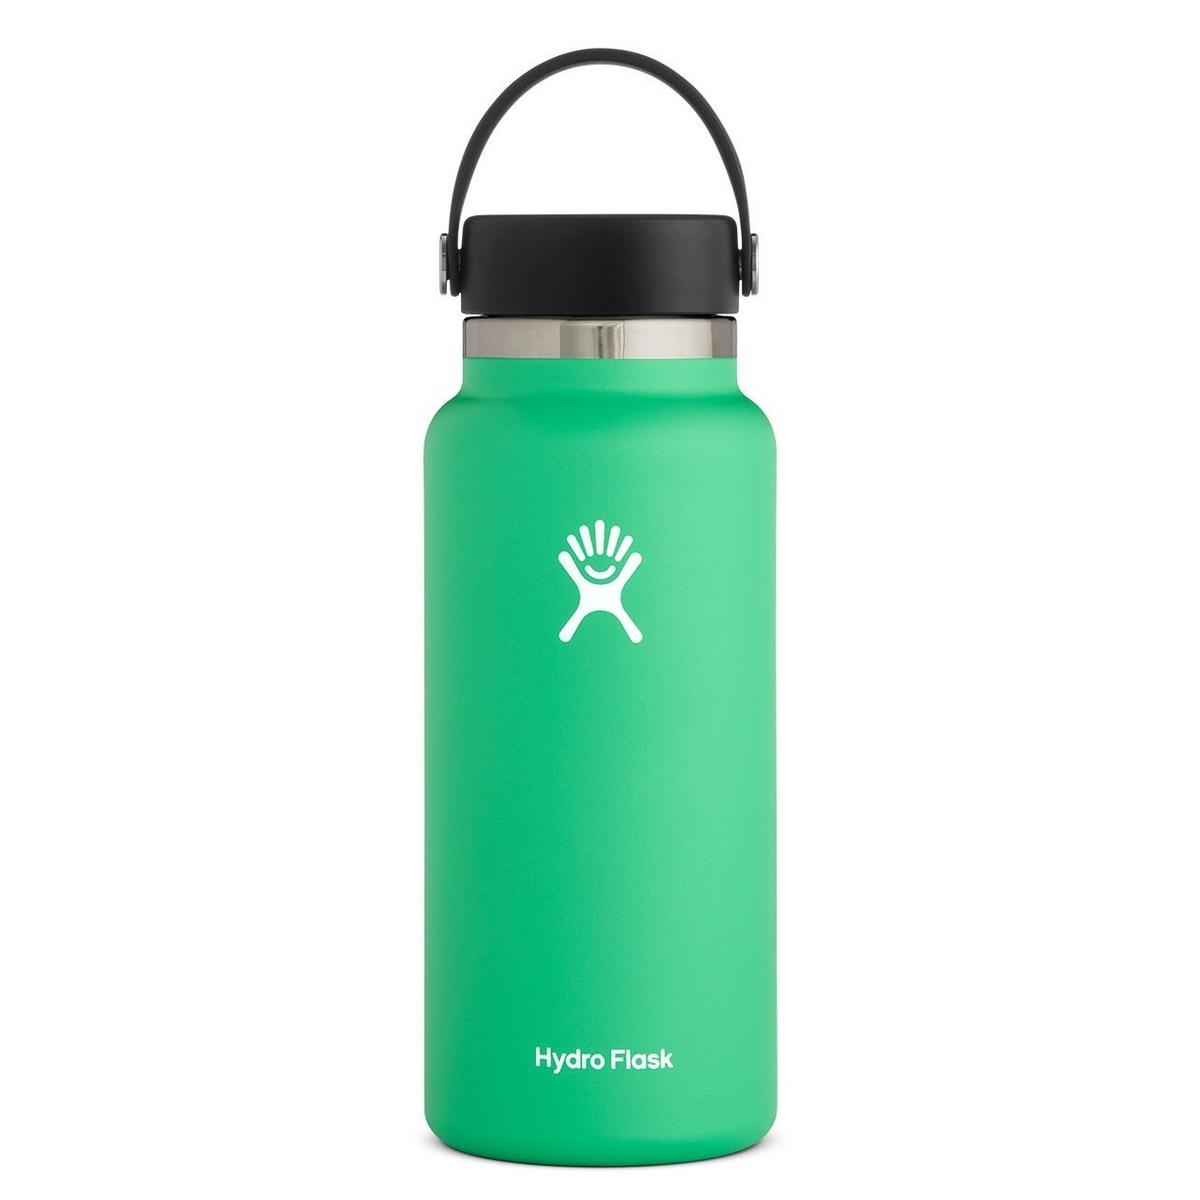 Hydro Flask 32oz Wide Mouth - Spearmint